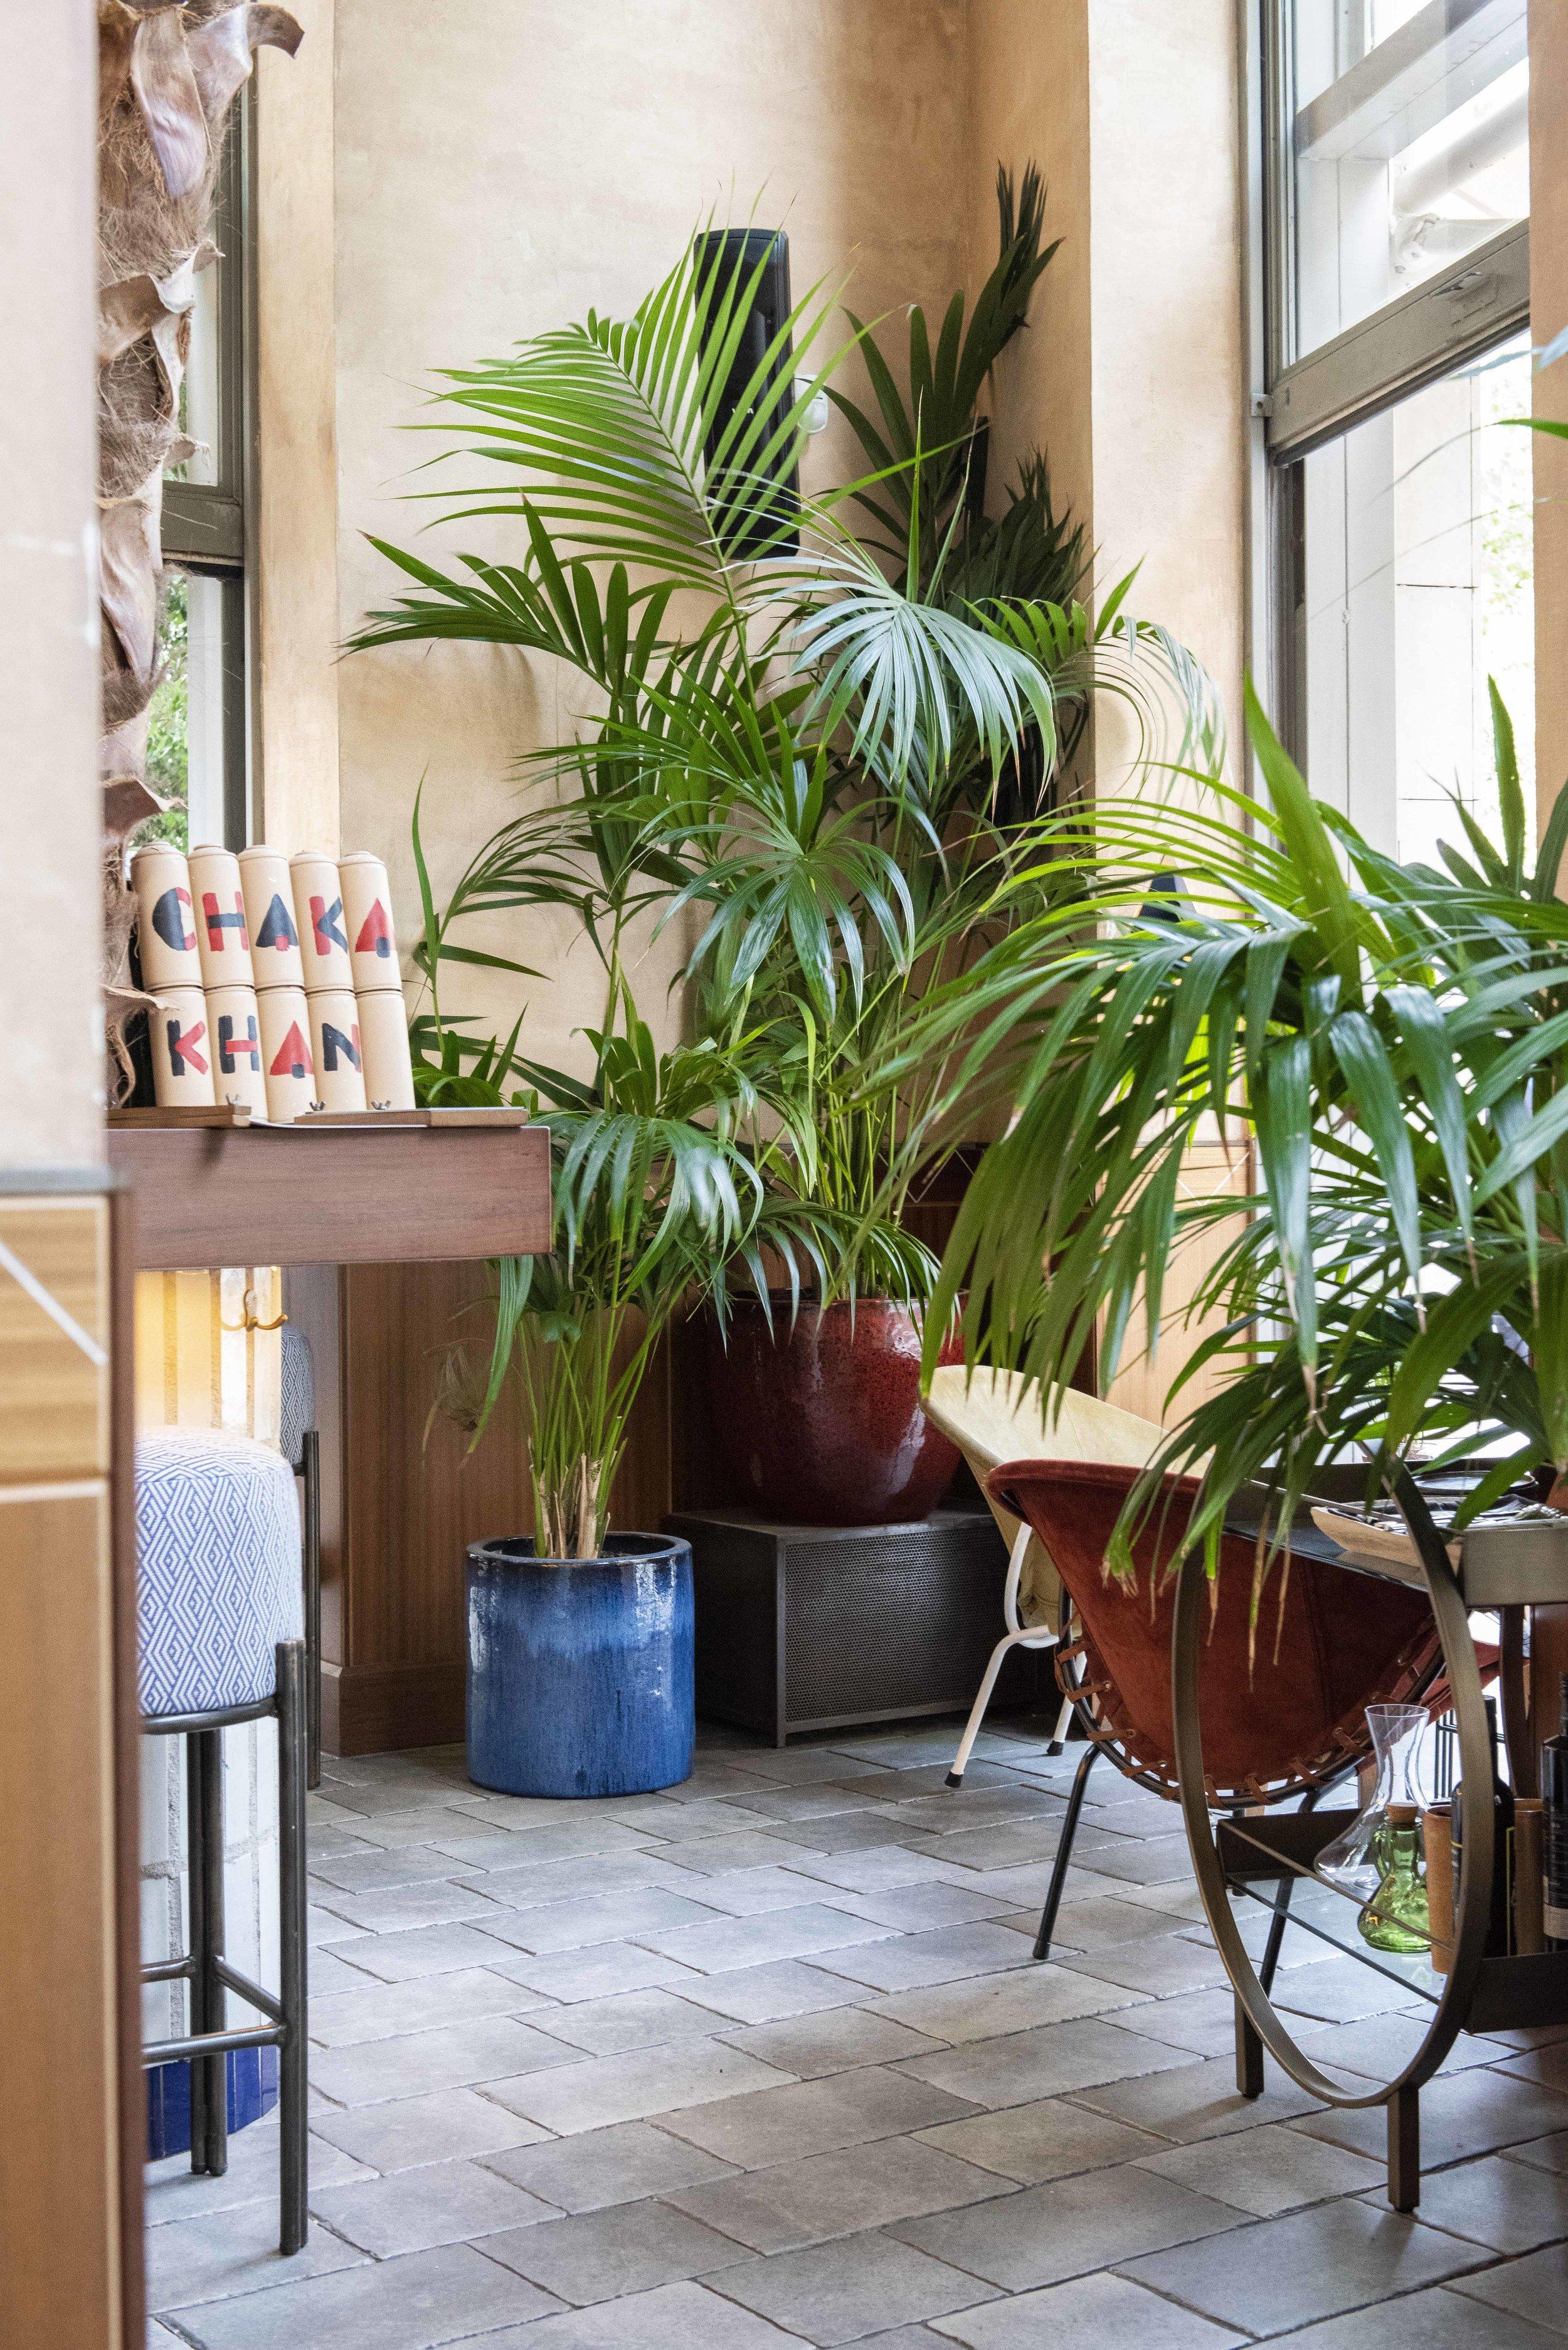 Chaka Khan restaurant, Barcelona. Photo © Barcelona Food Experience.